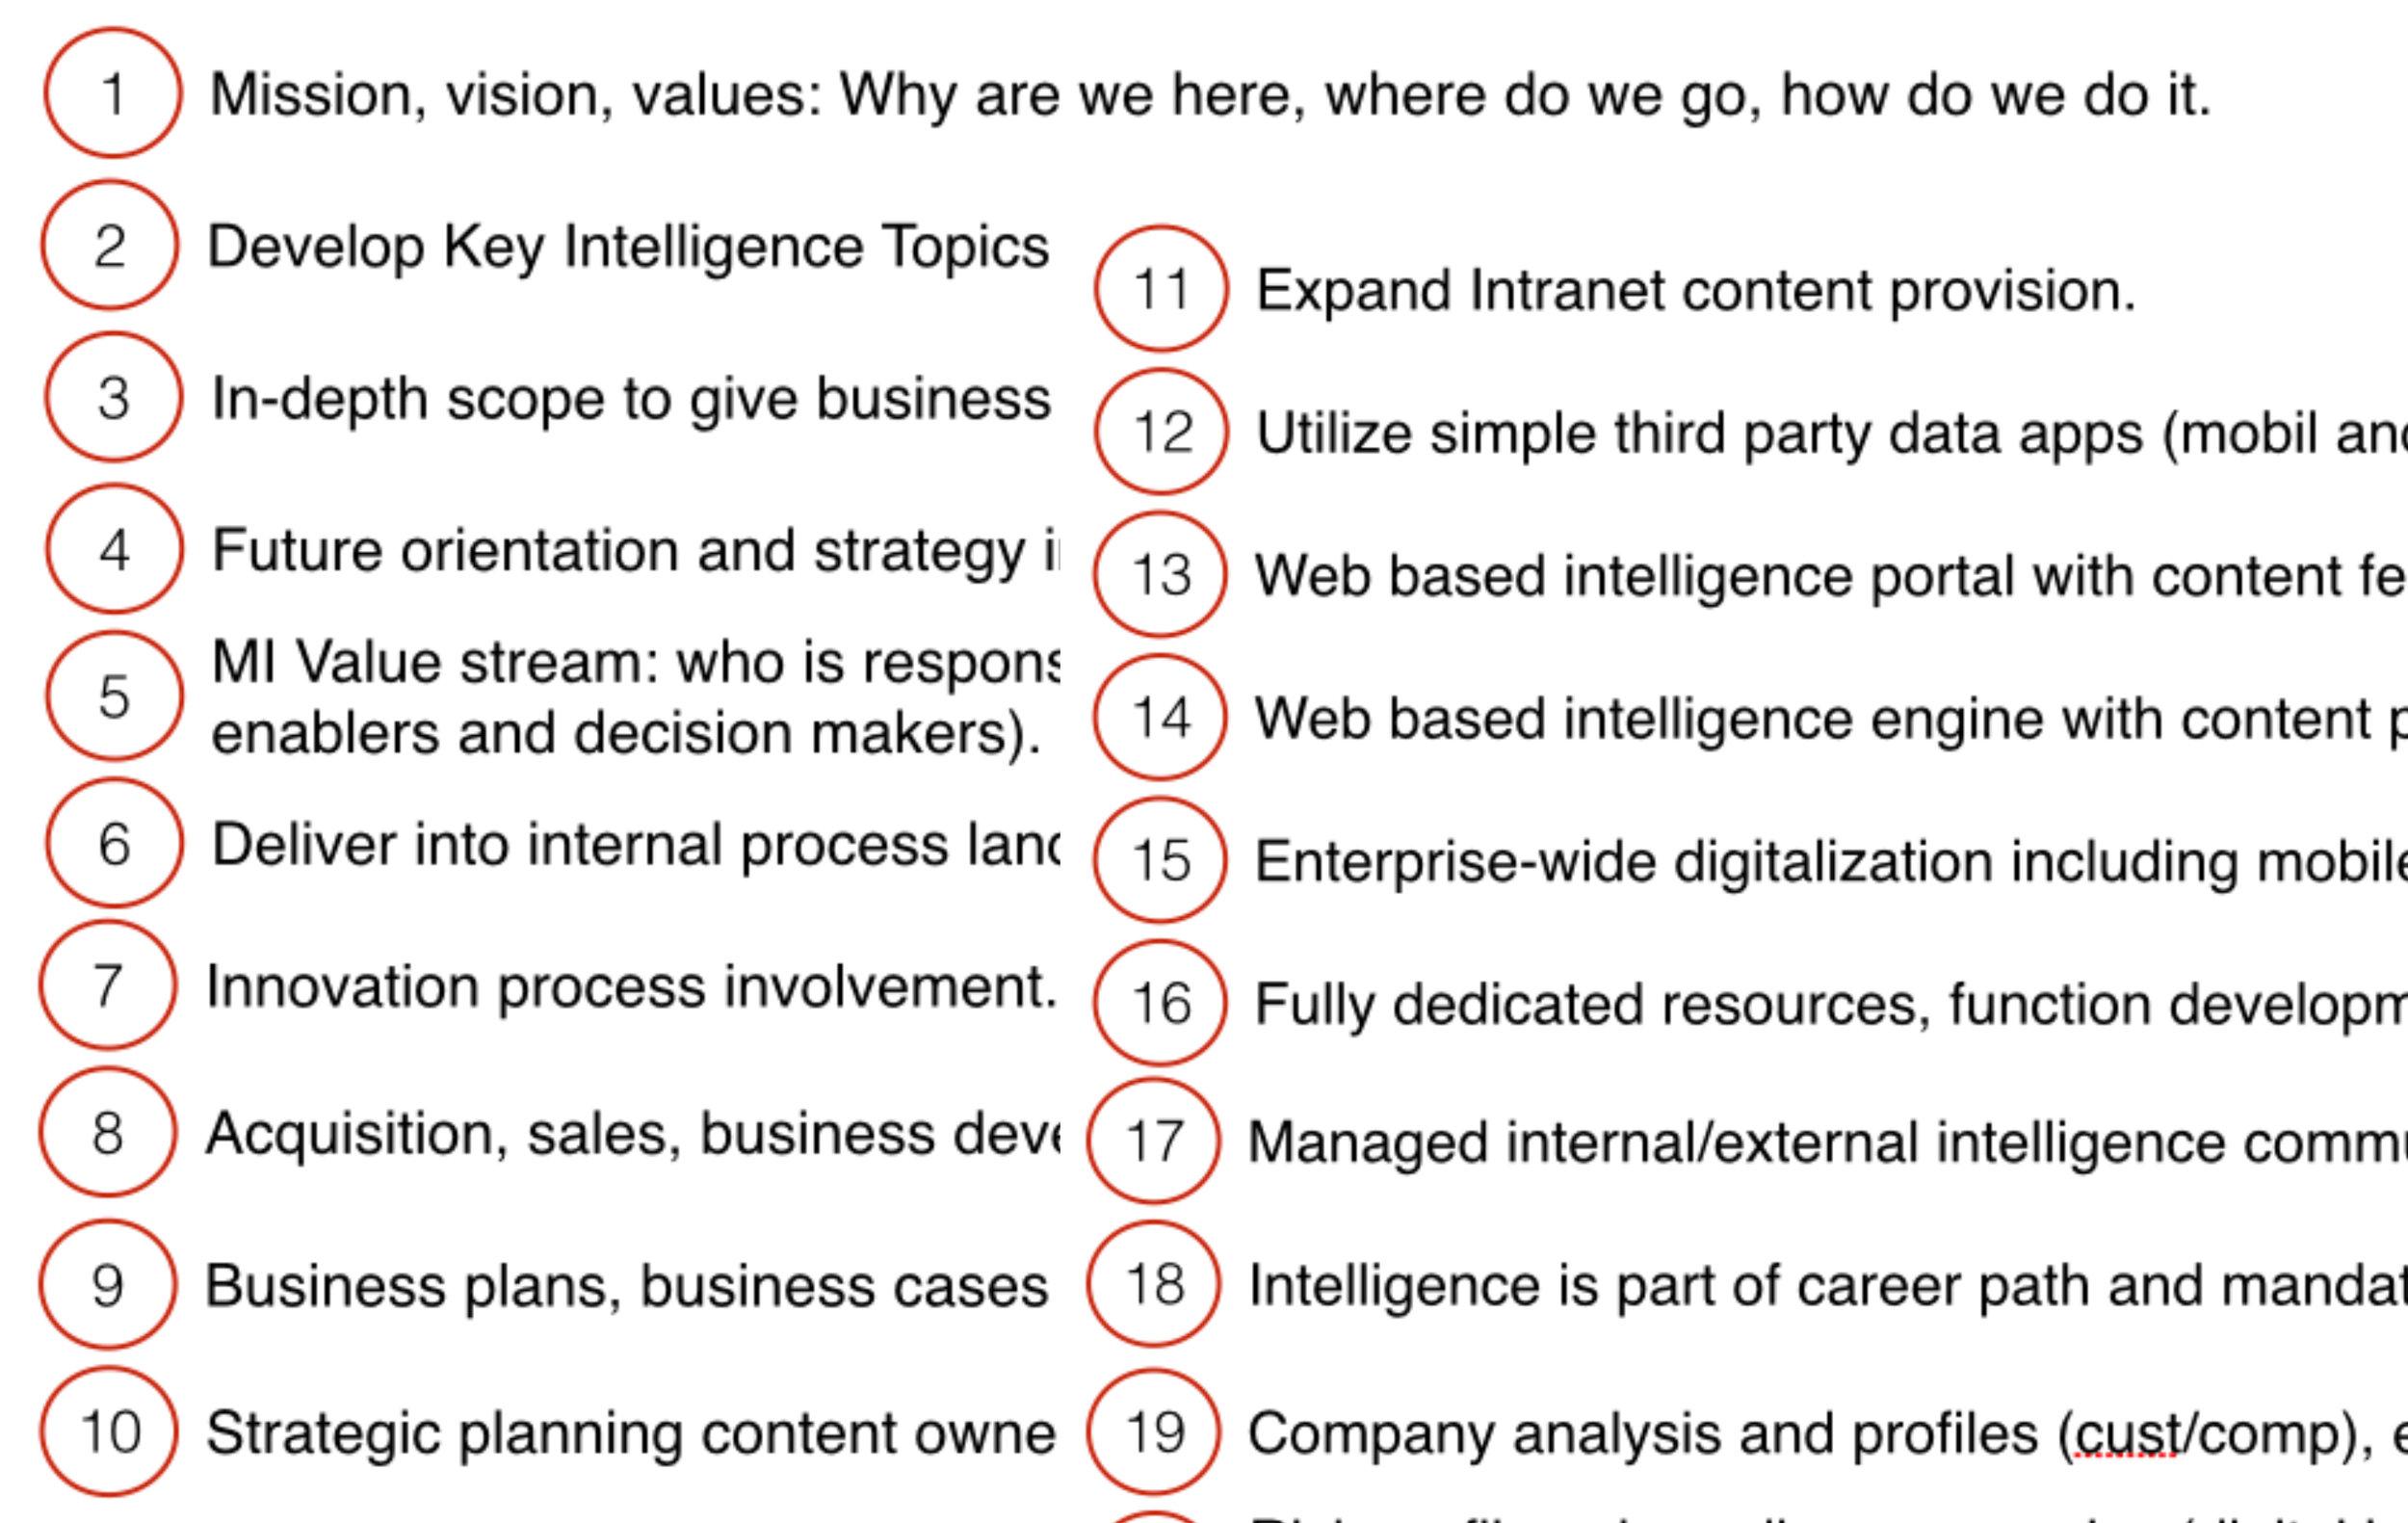 Market & Competitive Intelligence List Of Improvement Options